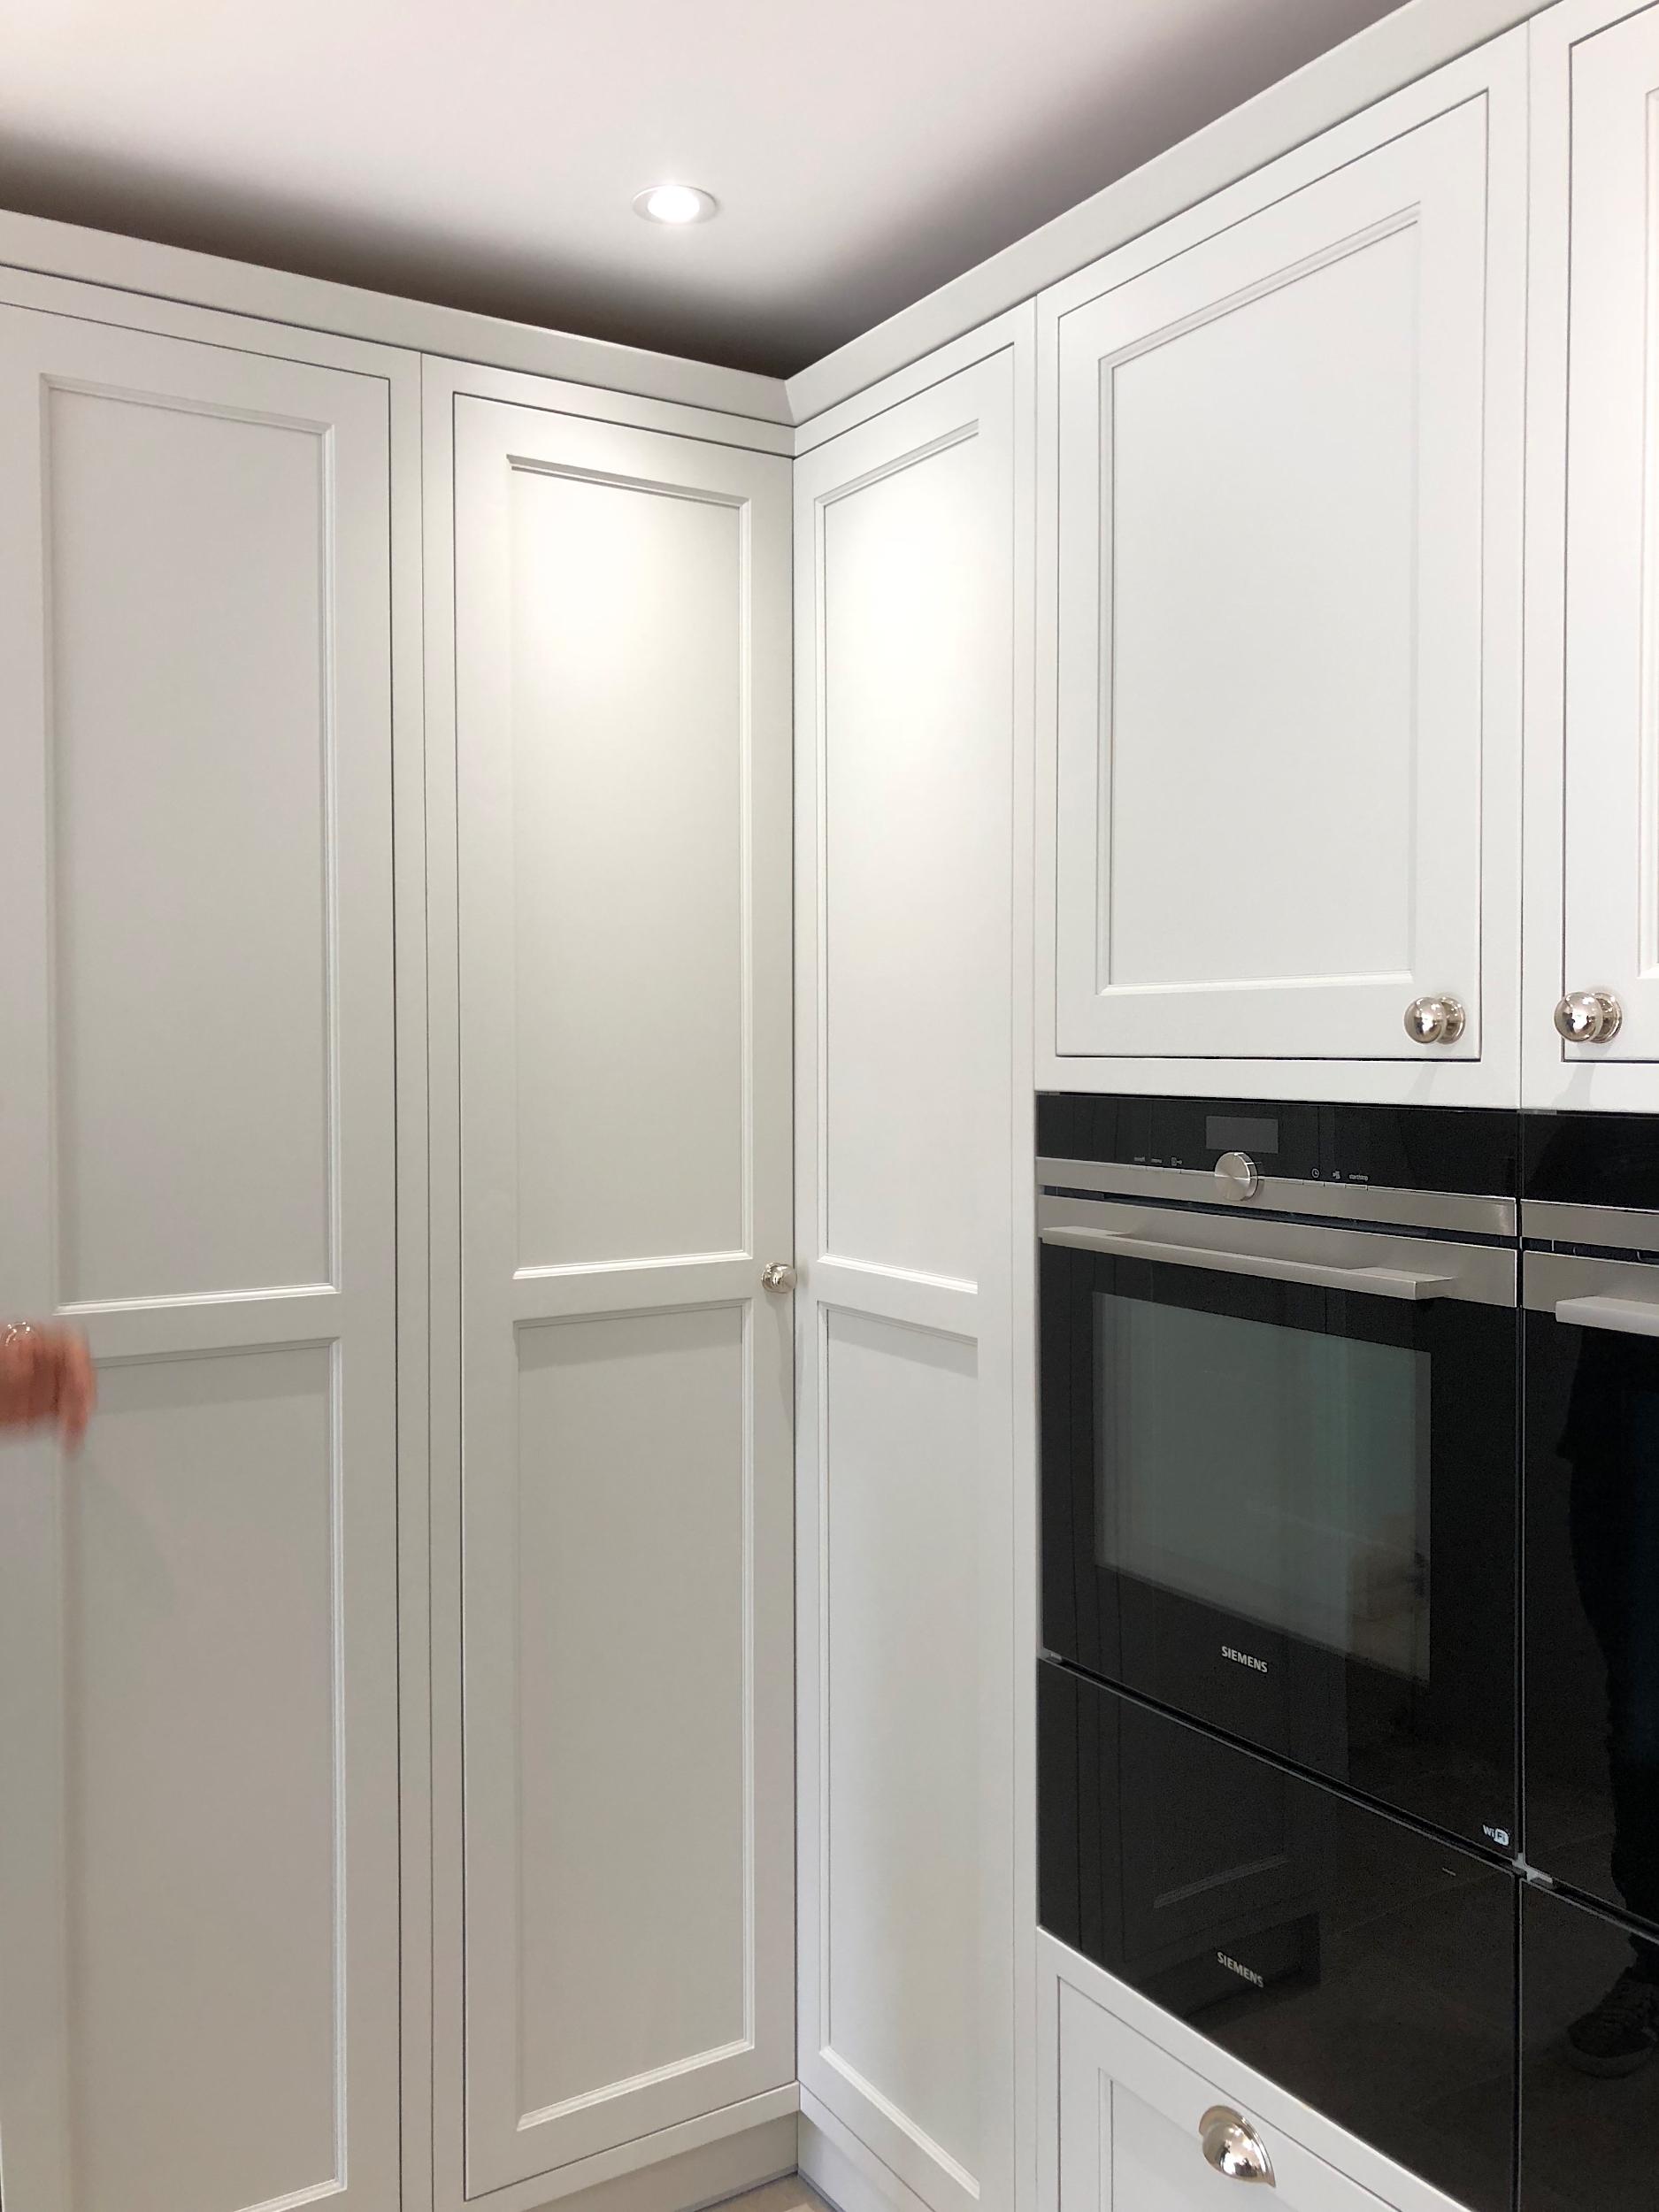 White Grey Shaker Wood Kitchen Oxfordshire 987.jpg